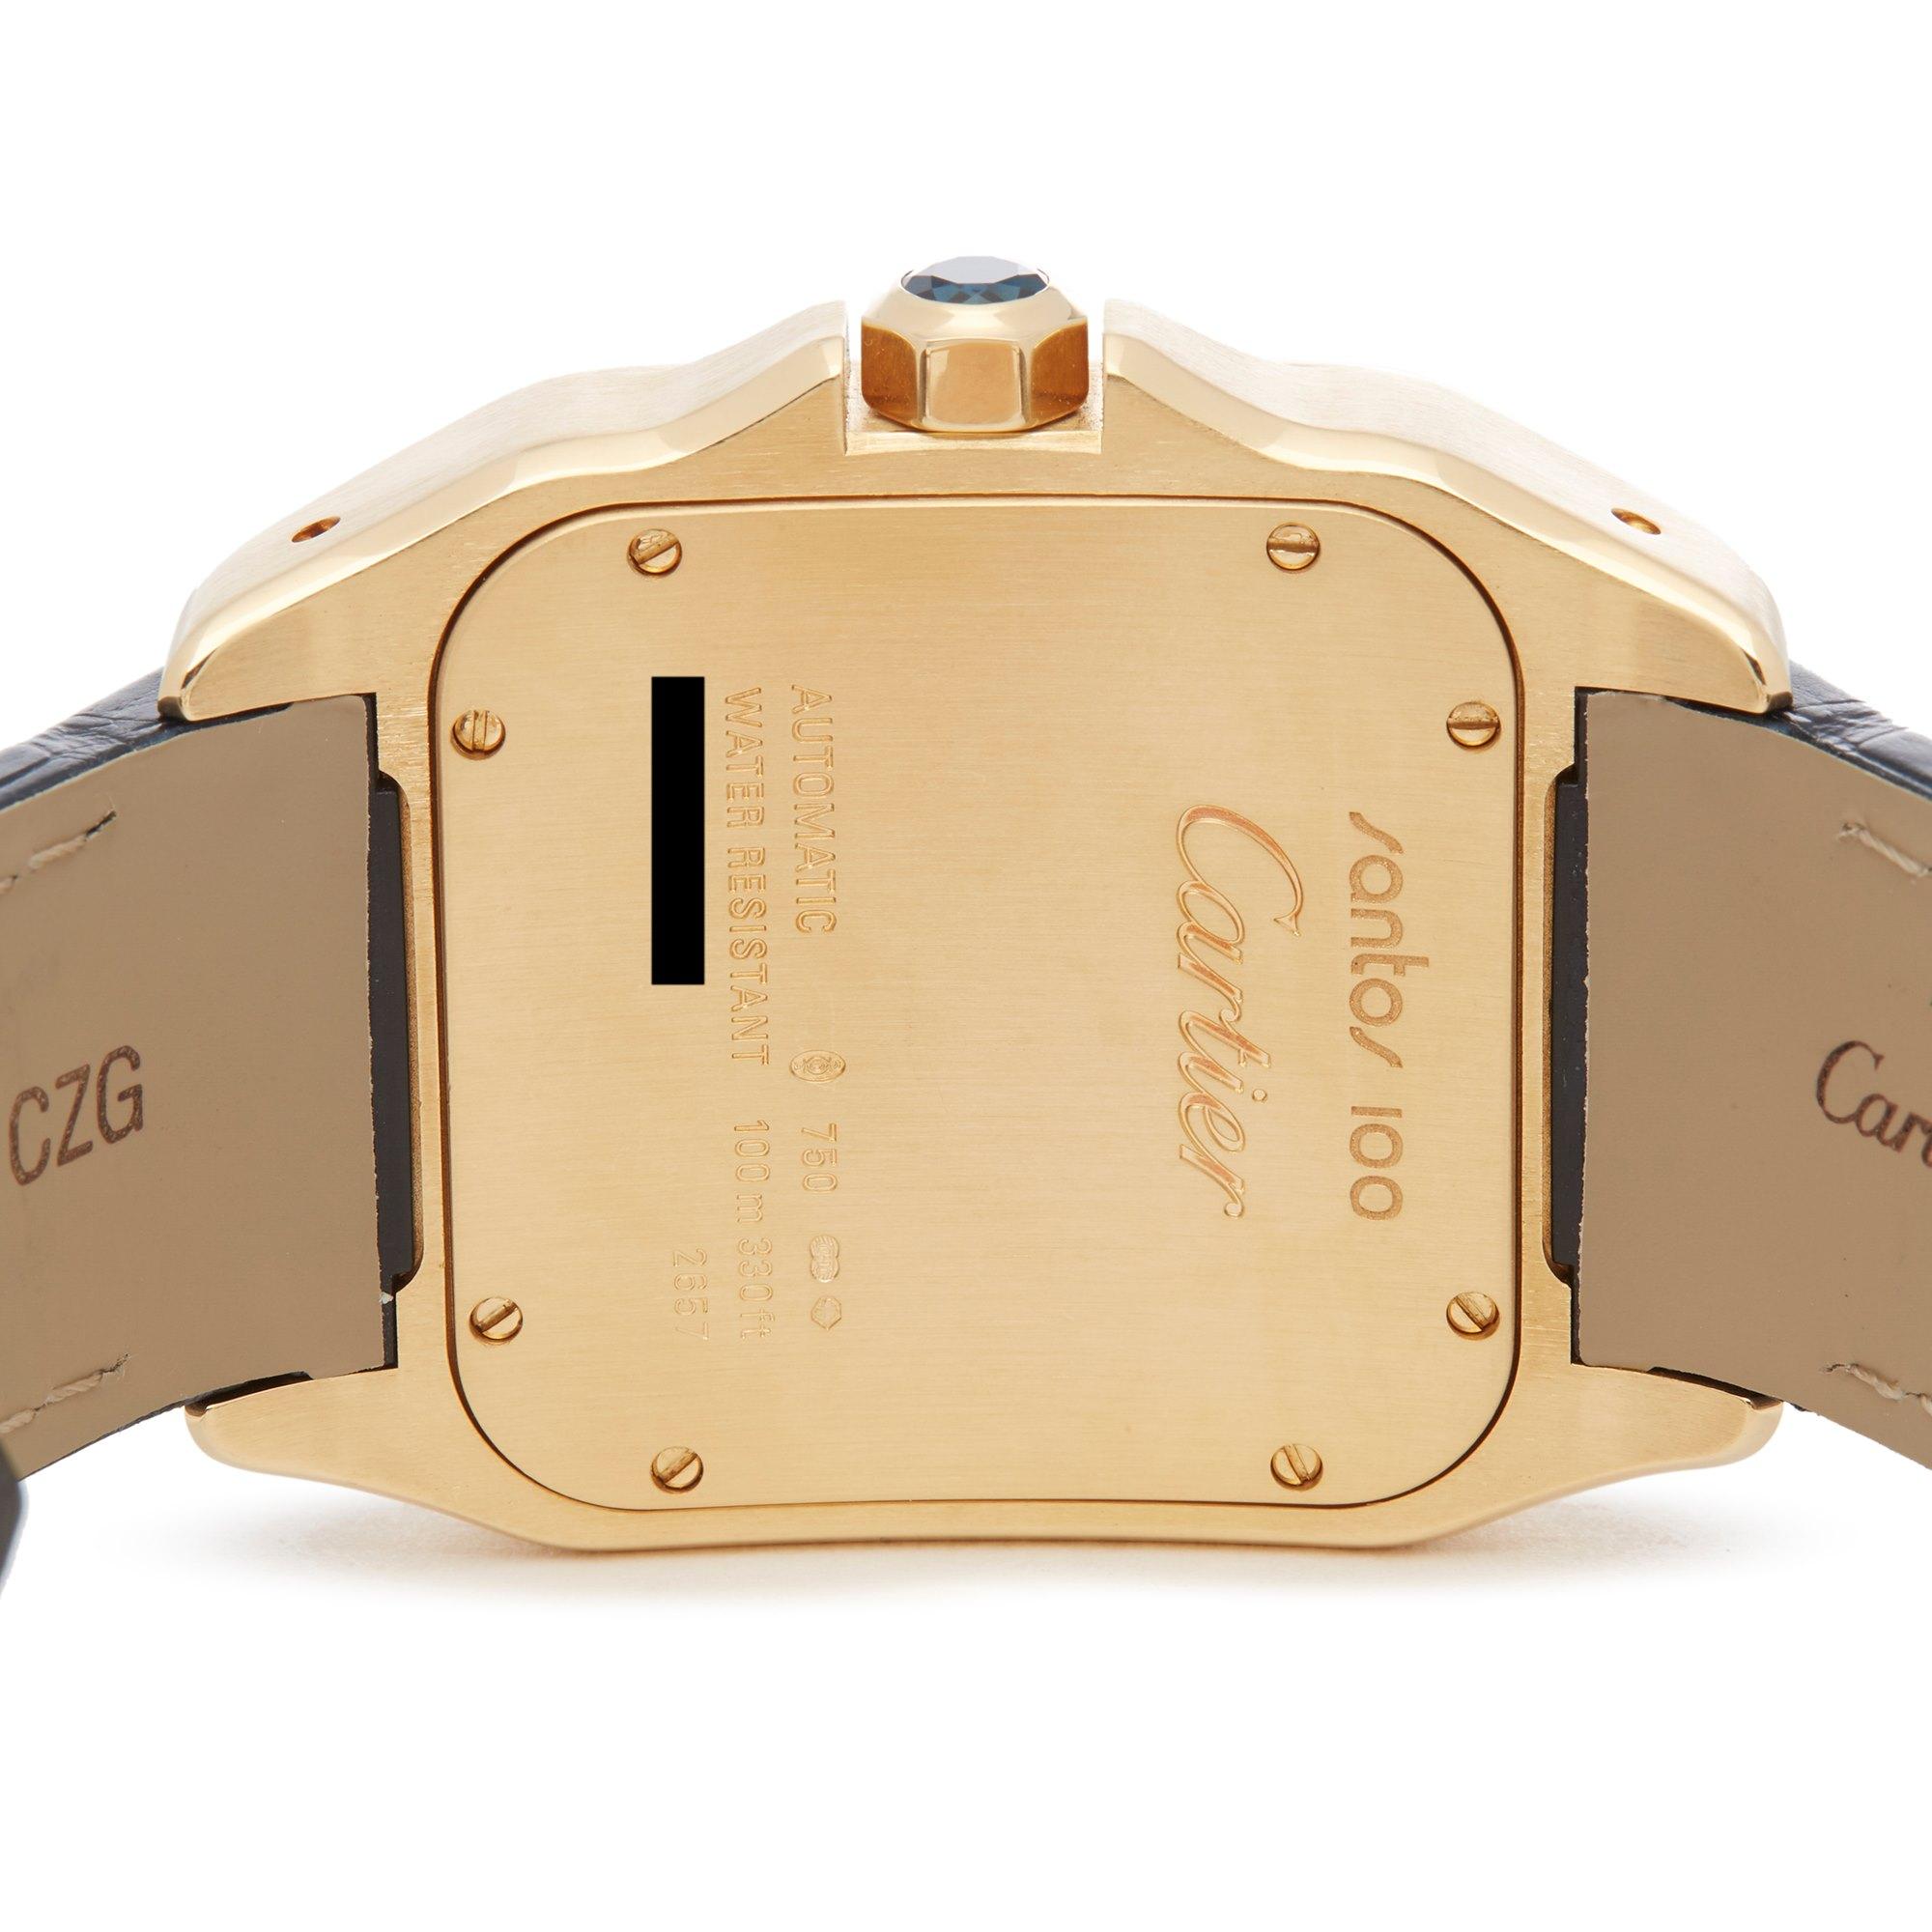 Cartier Santos 100 W20071Y1 or 2657 Men Yellow Gold Watch - Image 6 of 8